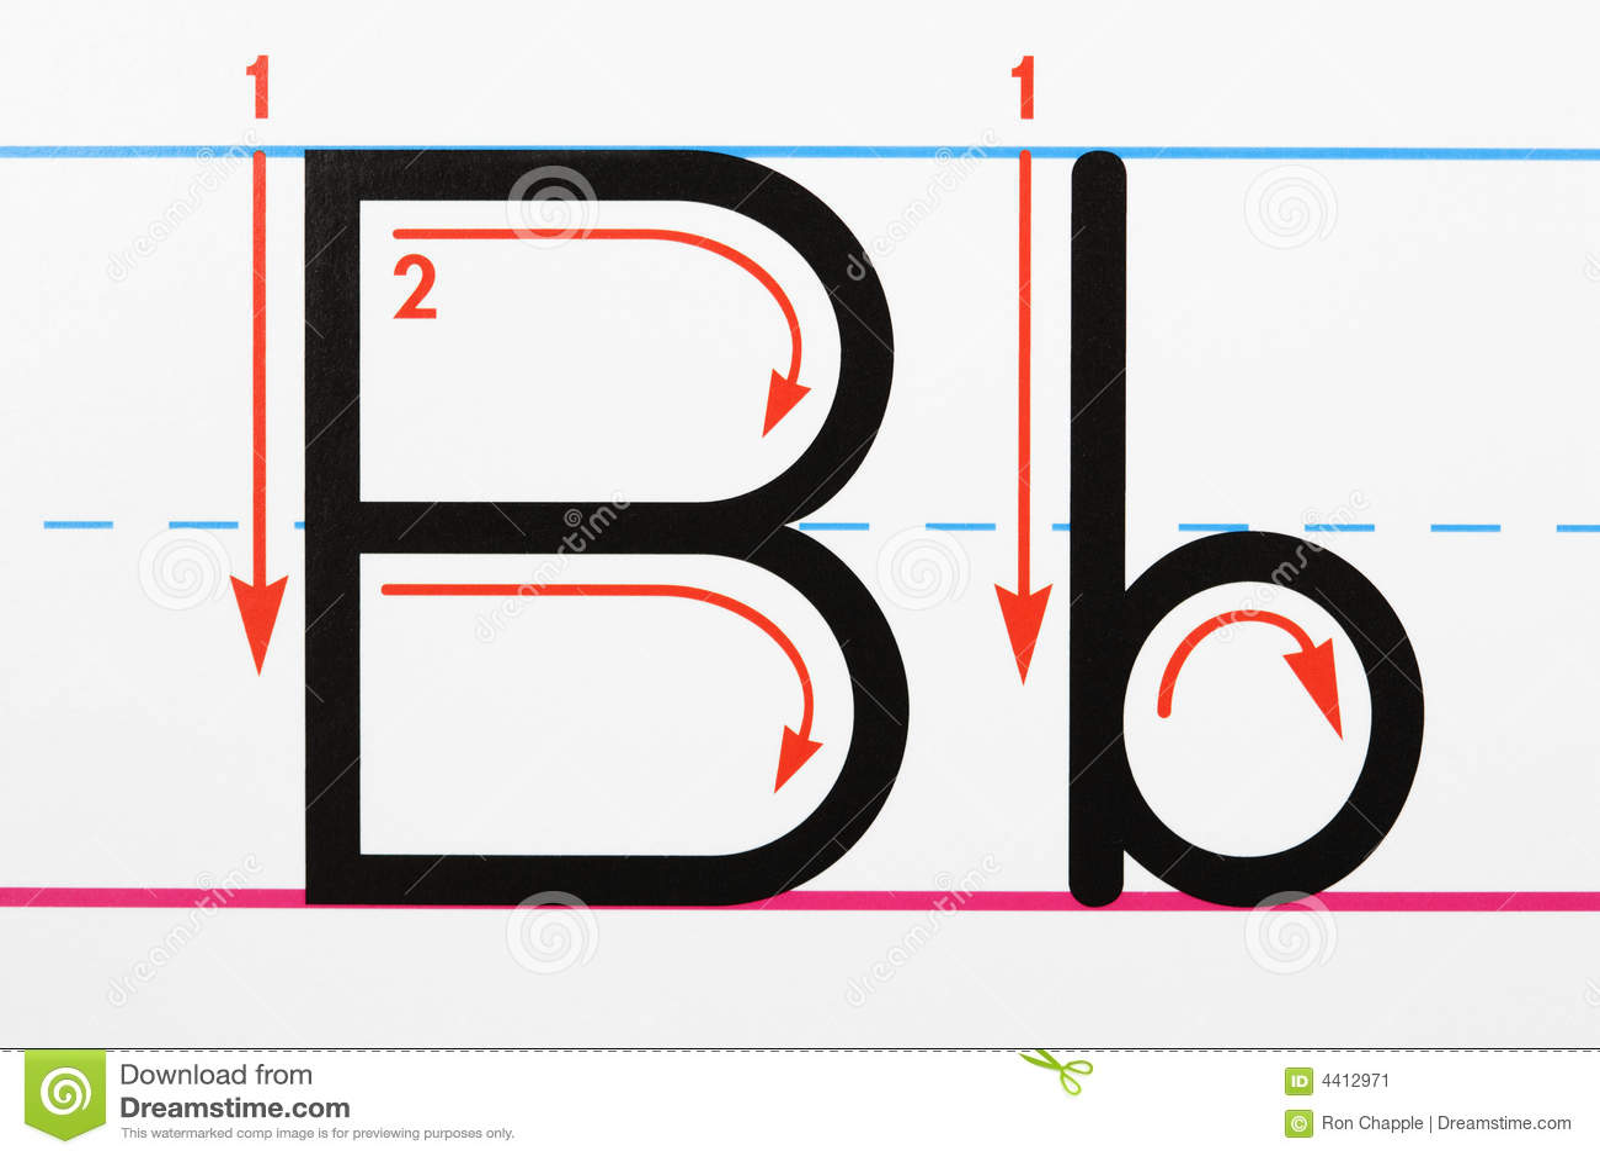 Letter B Handwriting Stock Image Image Of Language